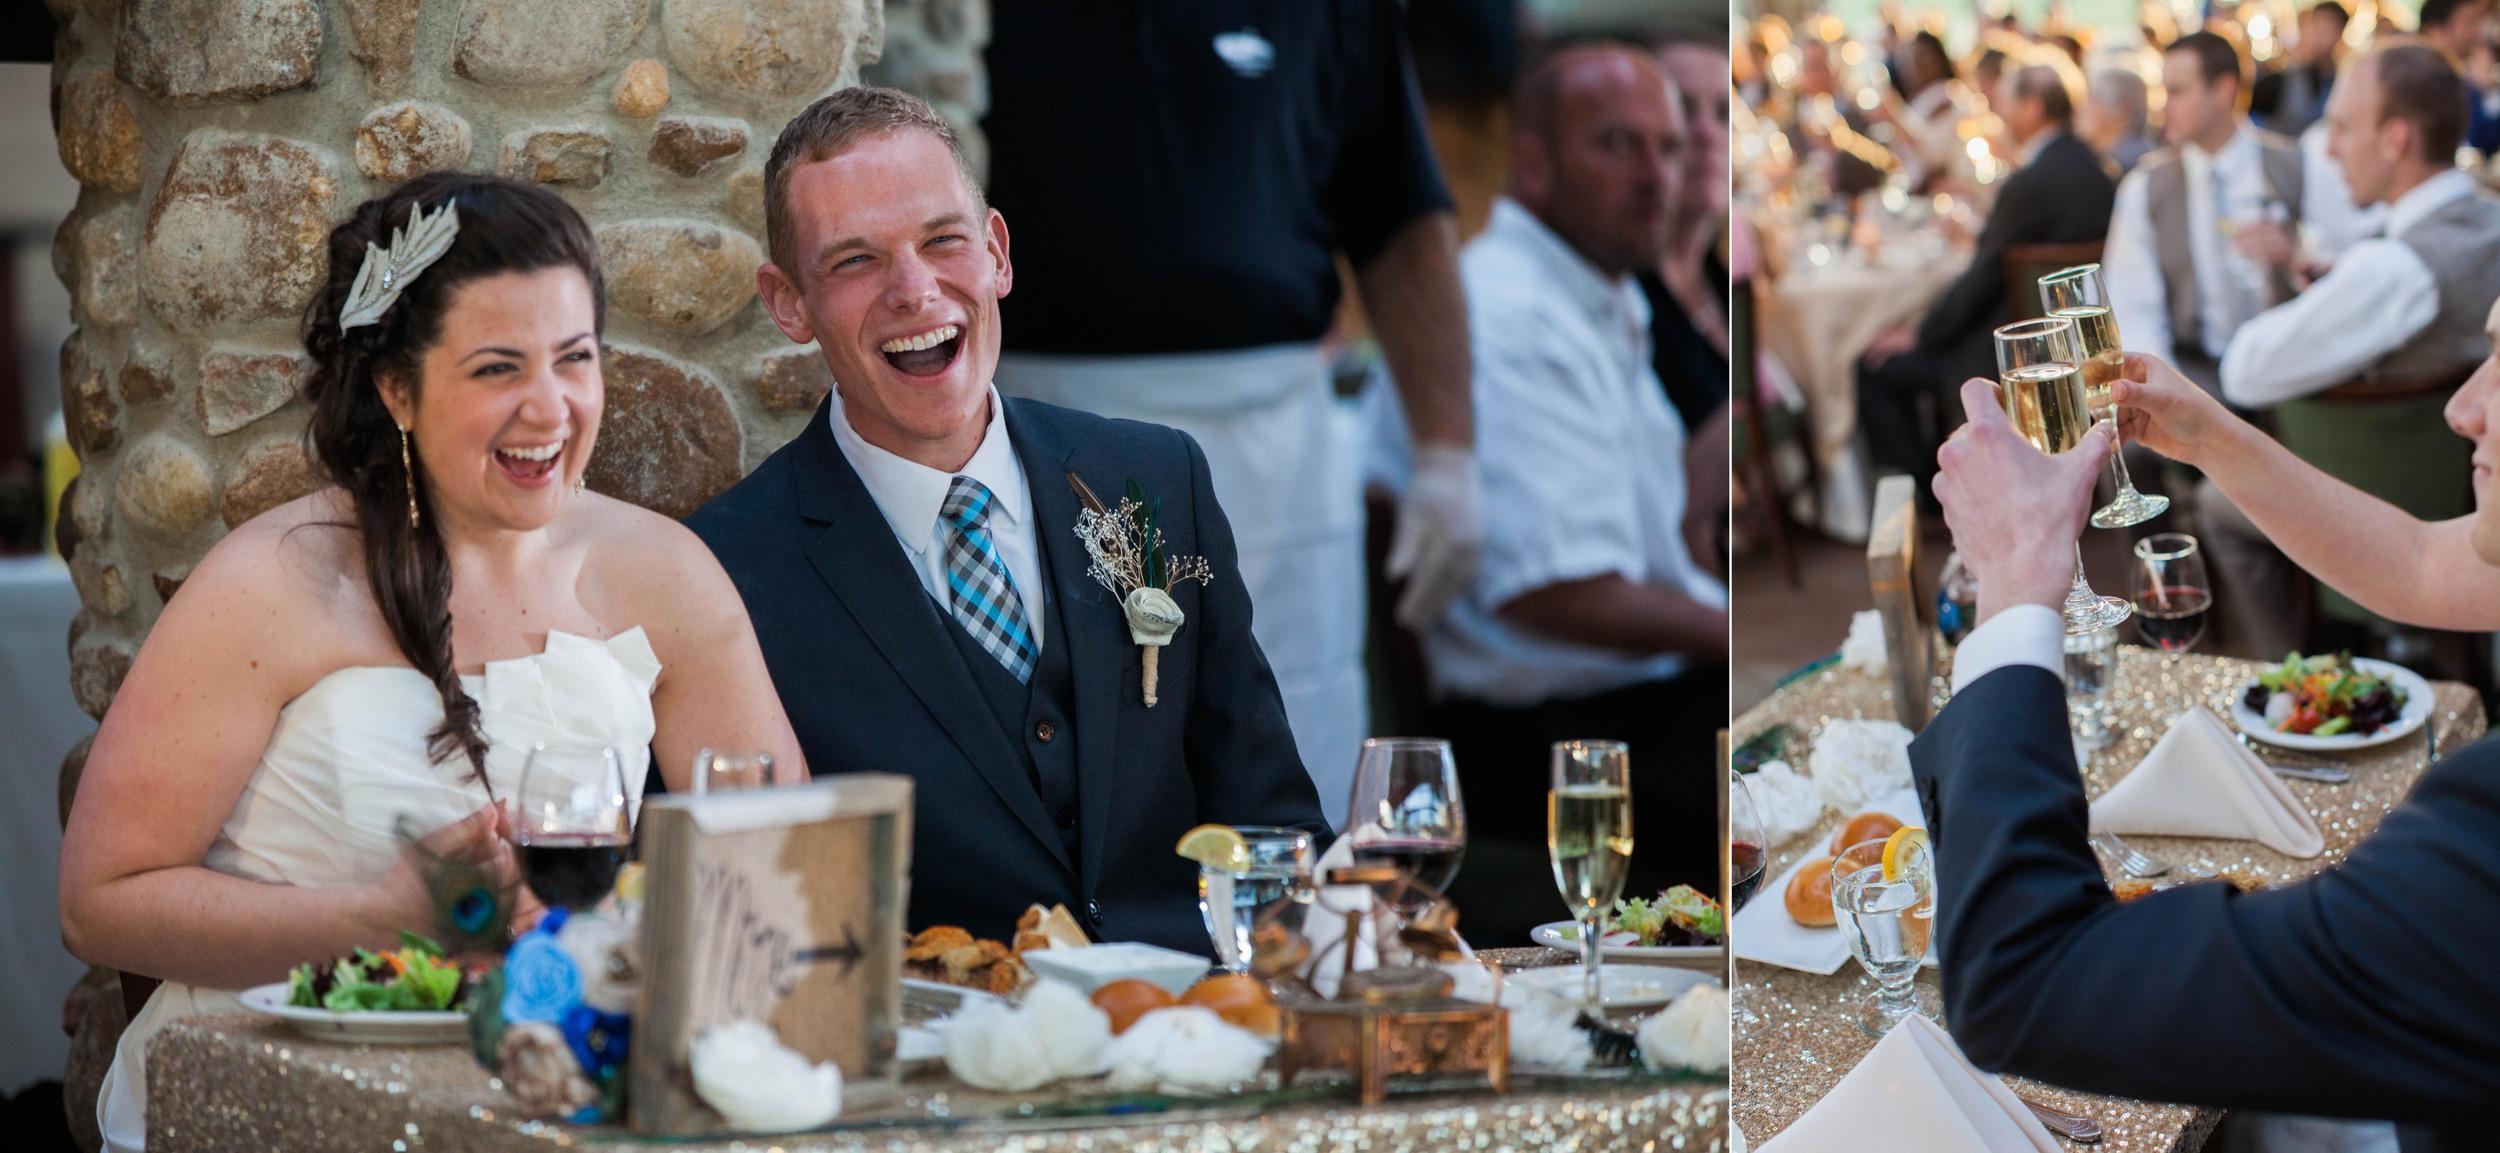 St Louis Wedding Photography-1066 copy.jpg